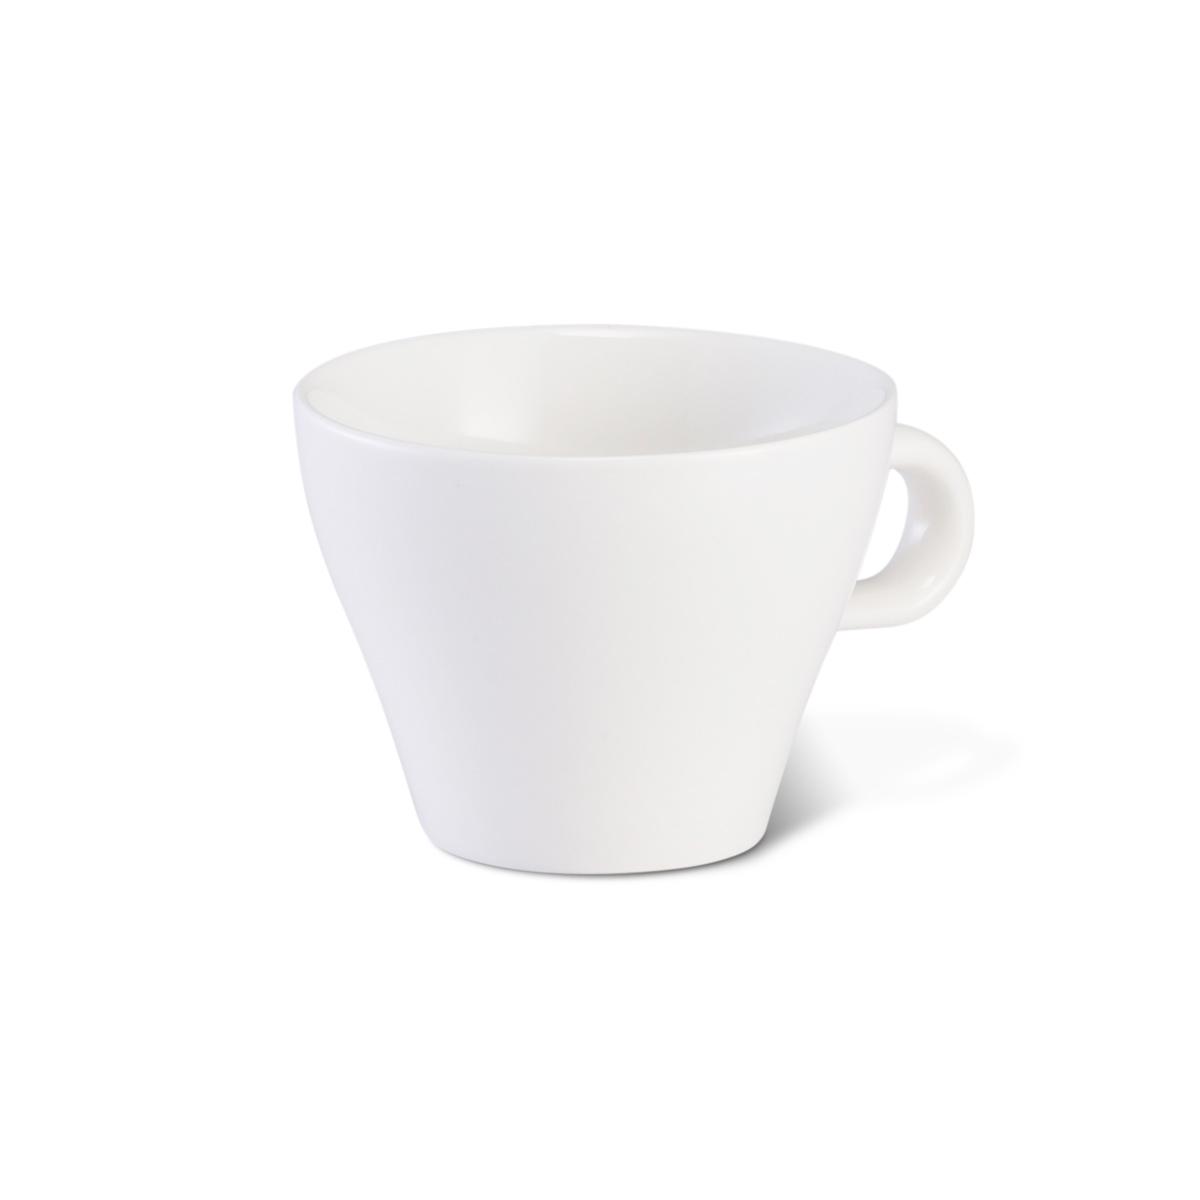 Šálek na cappuccino ALL FIT ONE, Slim